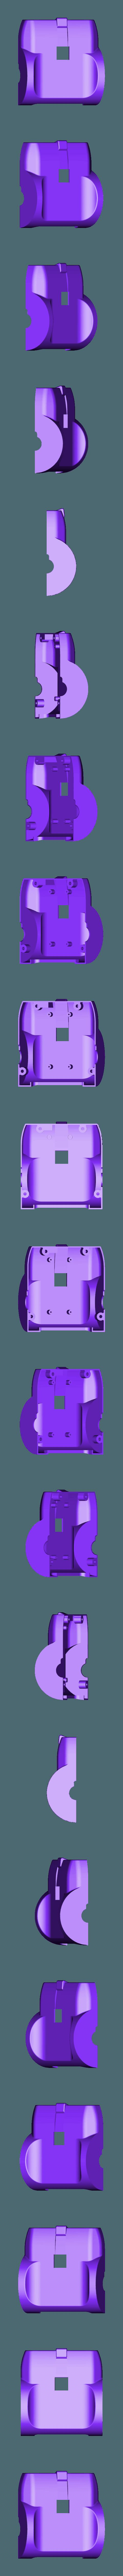 upper_shell.stl Télécharger fichier STL gratuit ZeroBot - Raspberry Pi Zero FPV Robot • Design à imprimer en 3D, MaxMKA